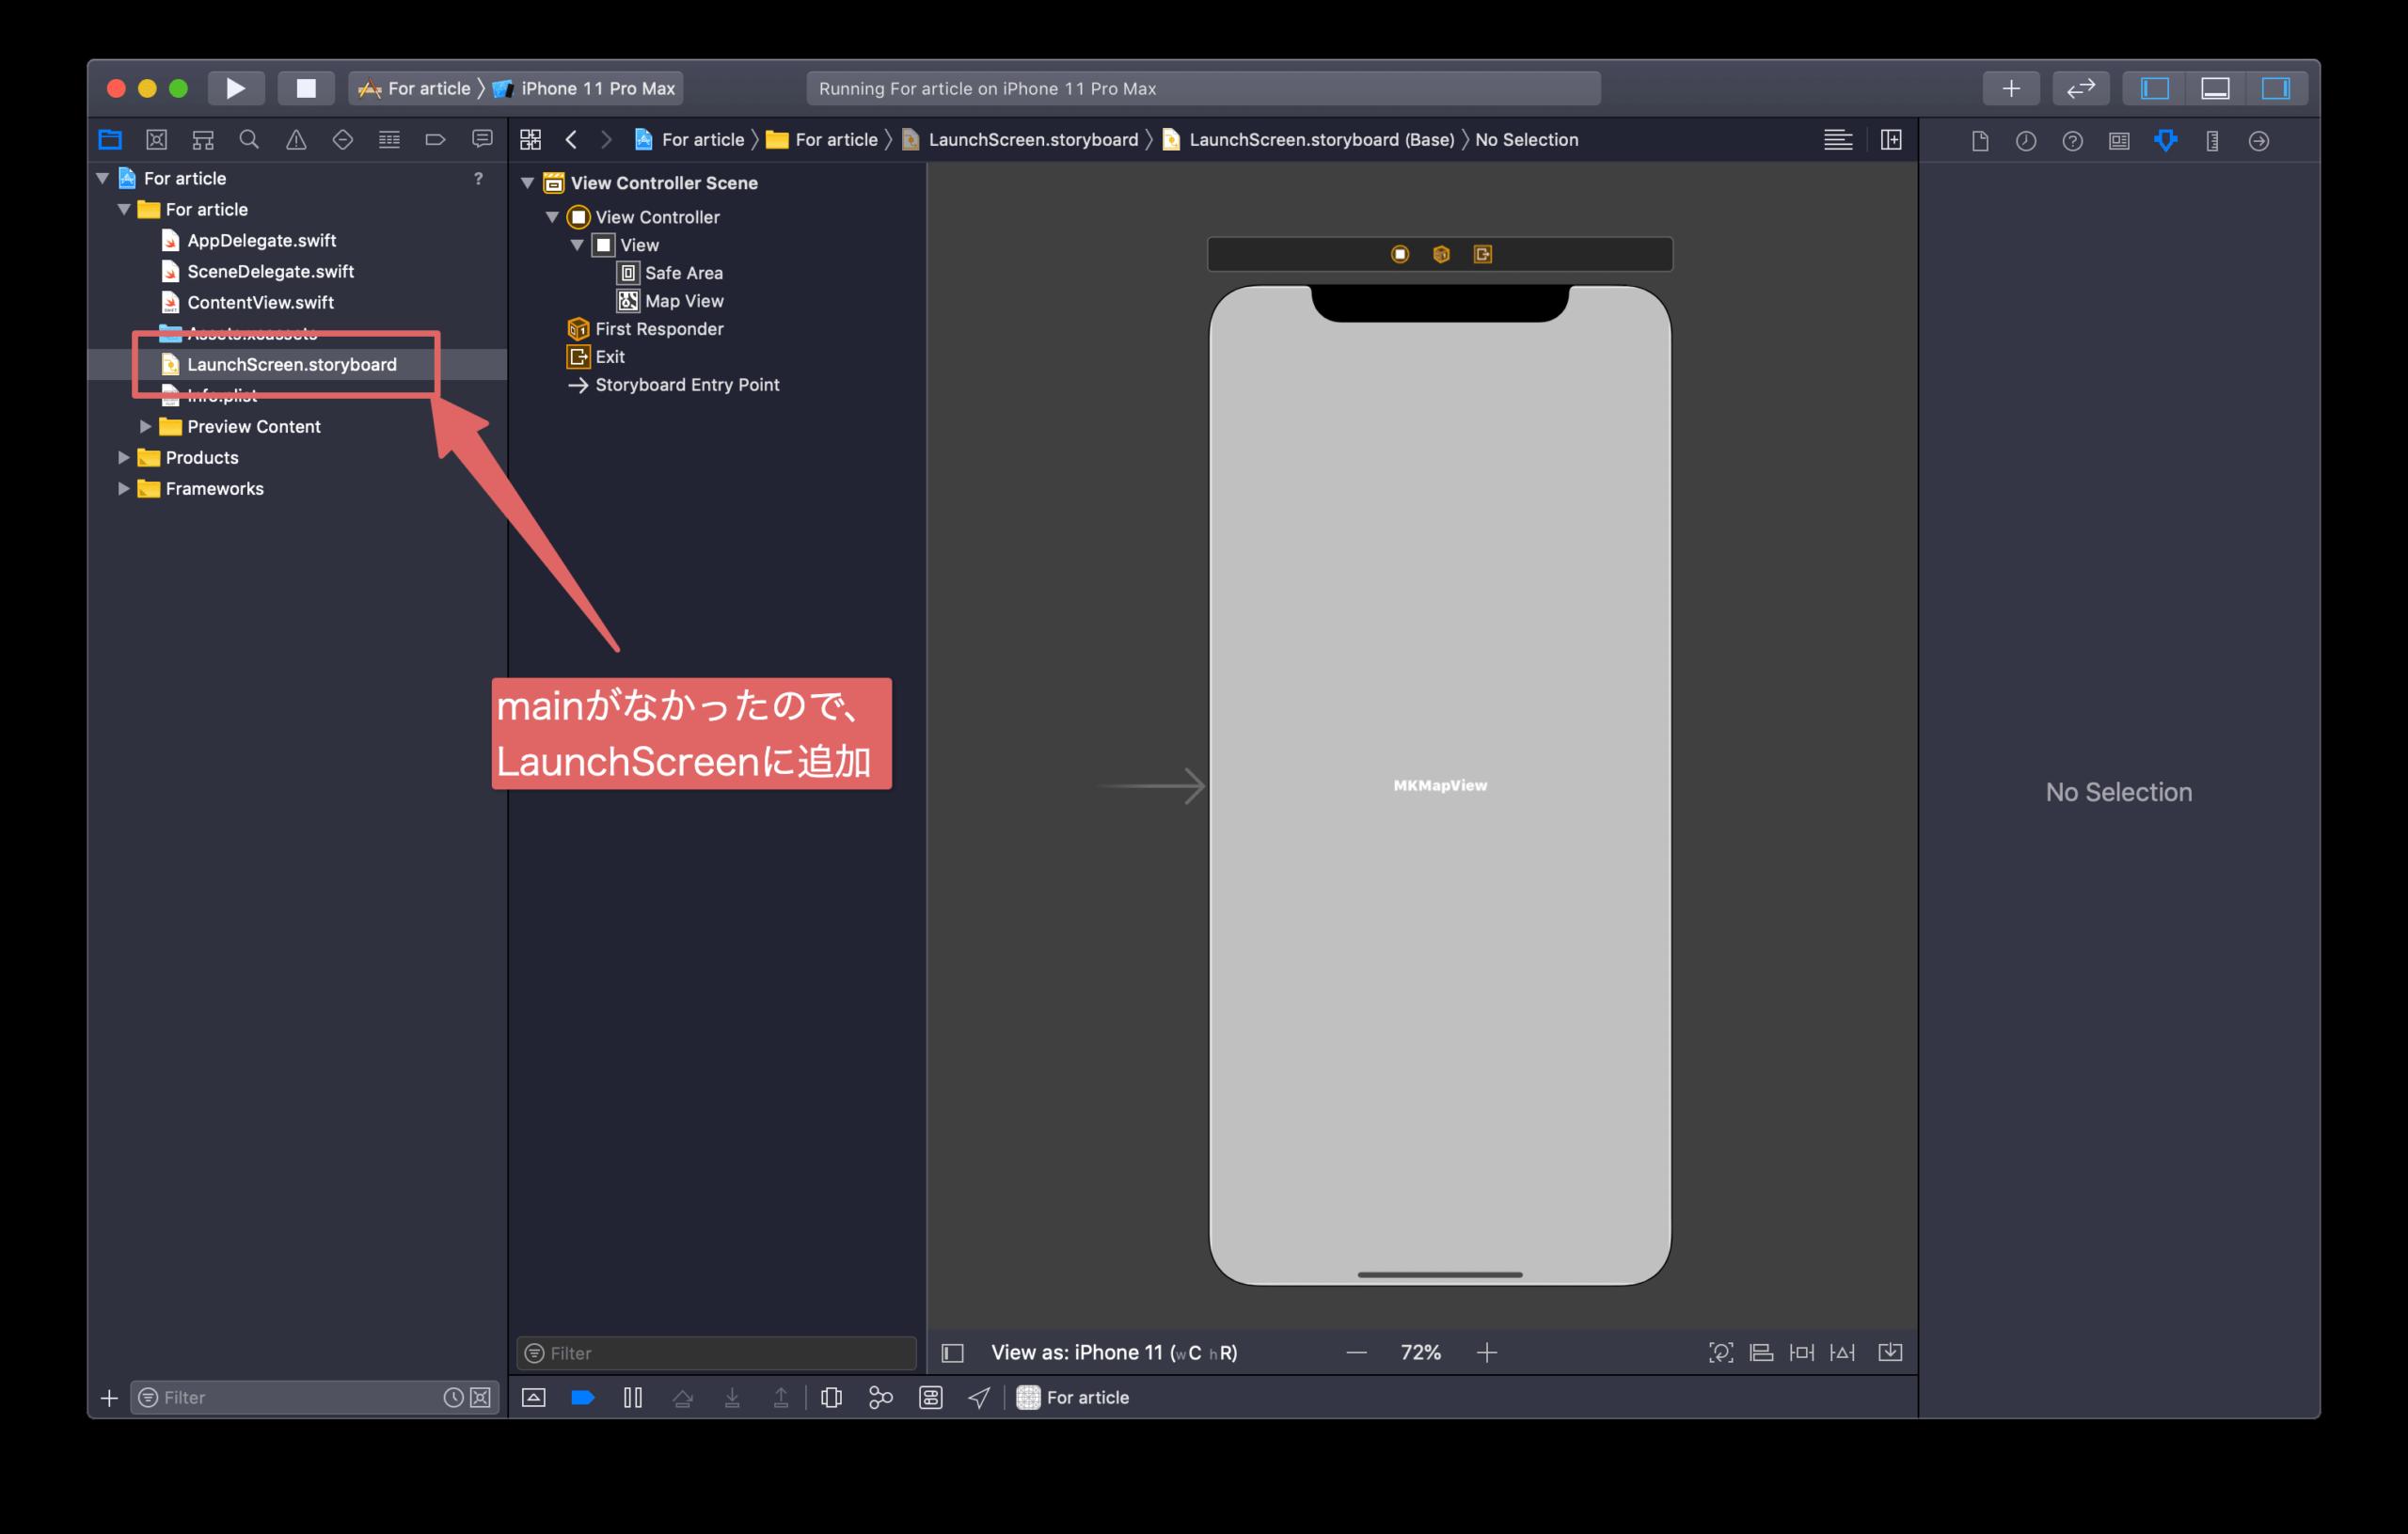 LaunchScreenにアイテムを追加した画像